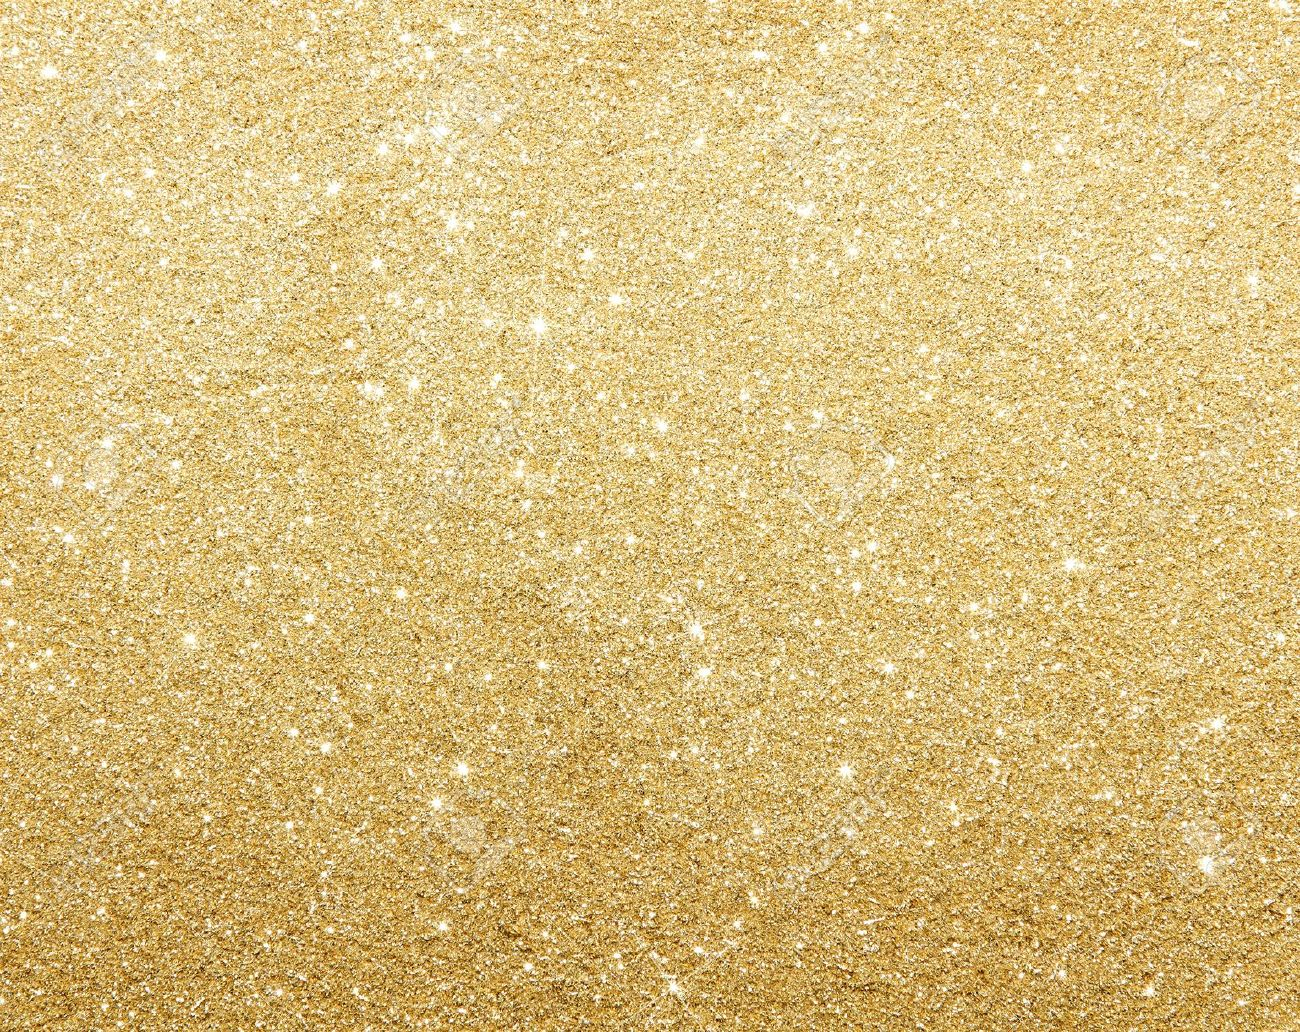 Gold Glitter Vector Gold Glitter Background Vector